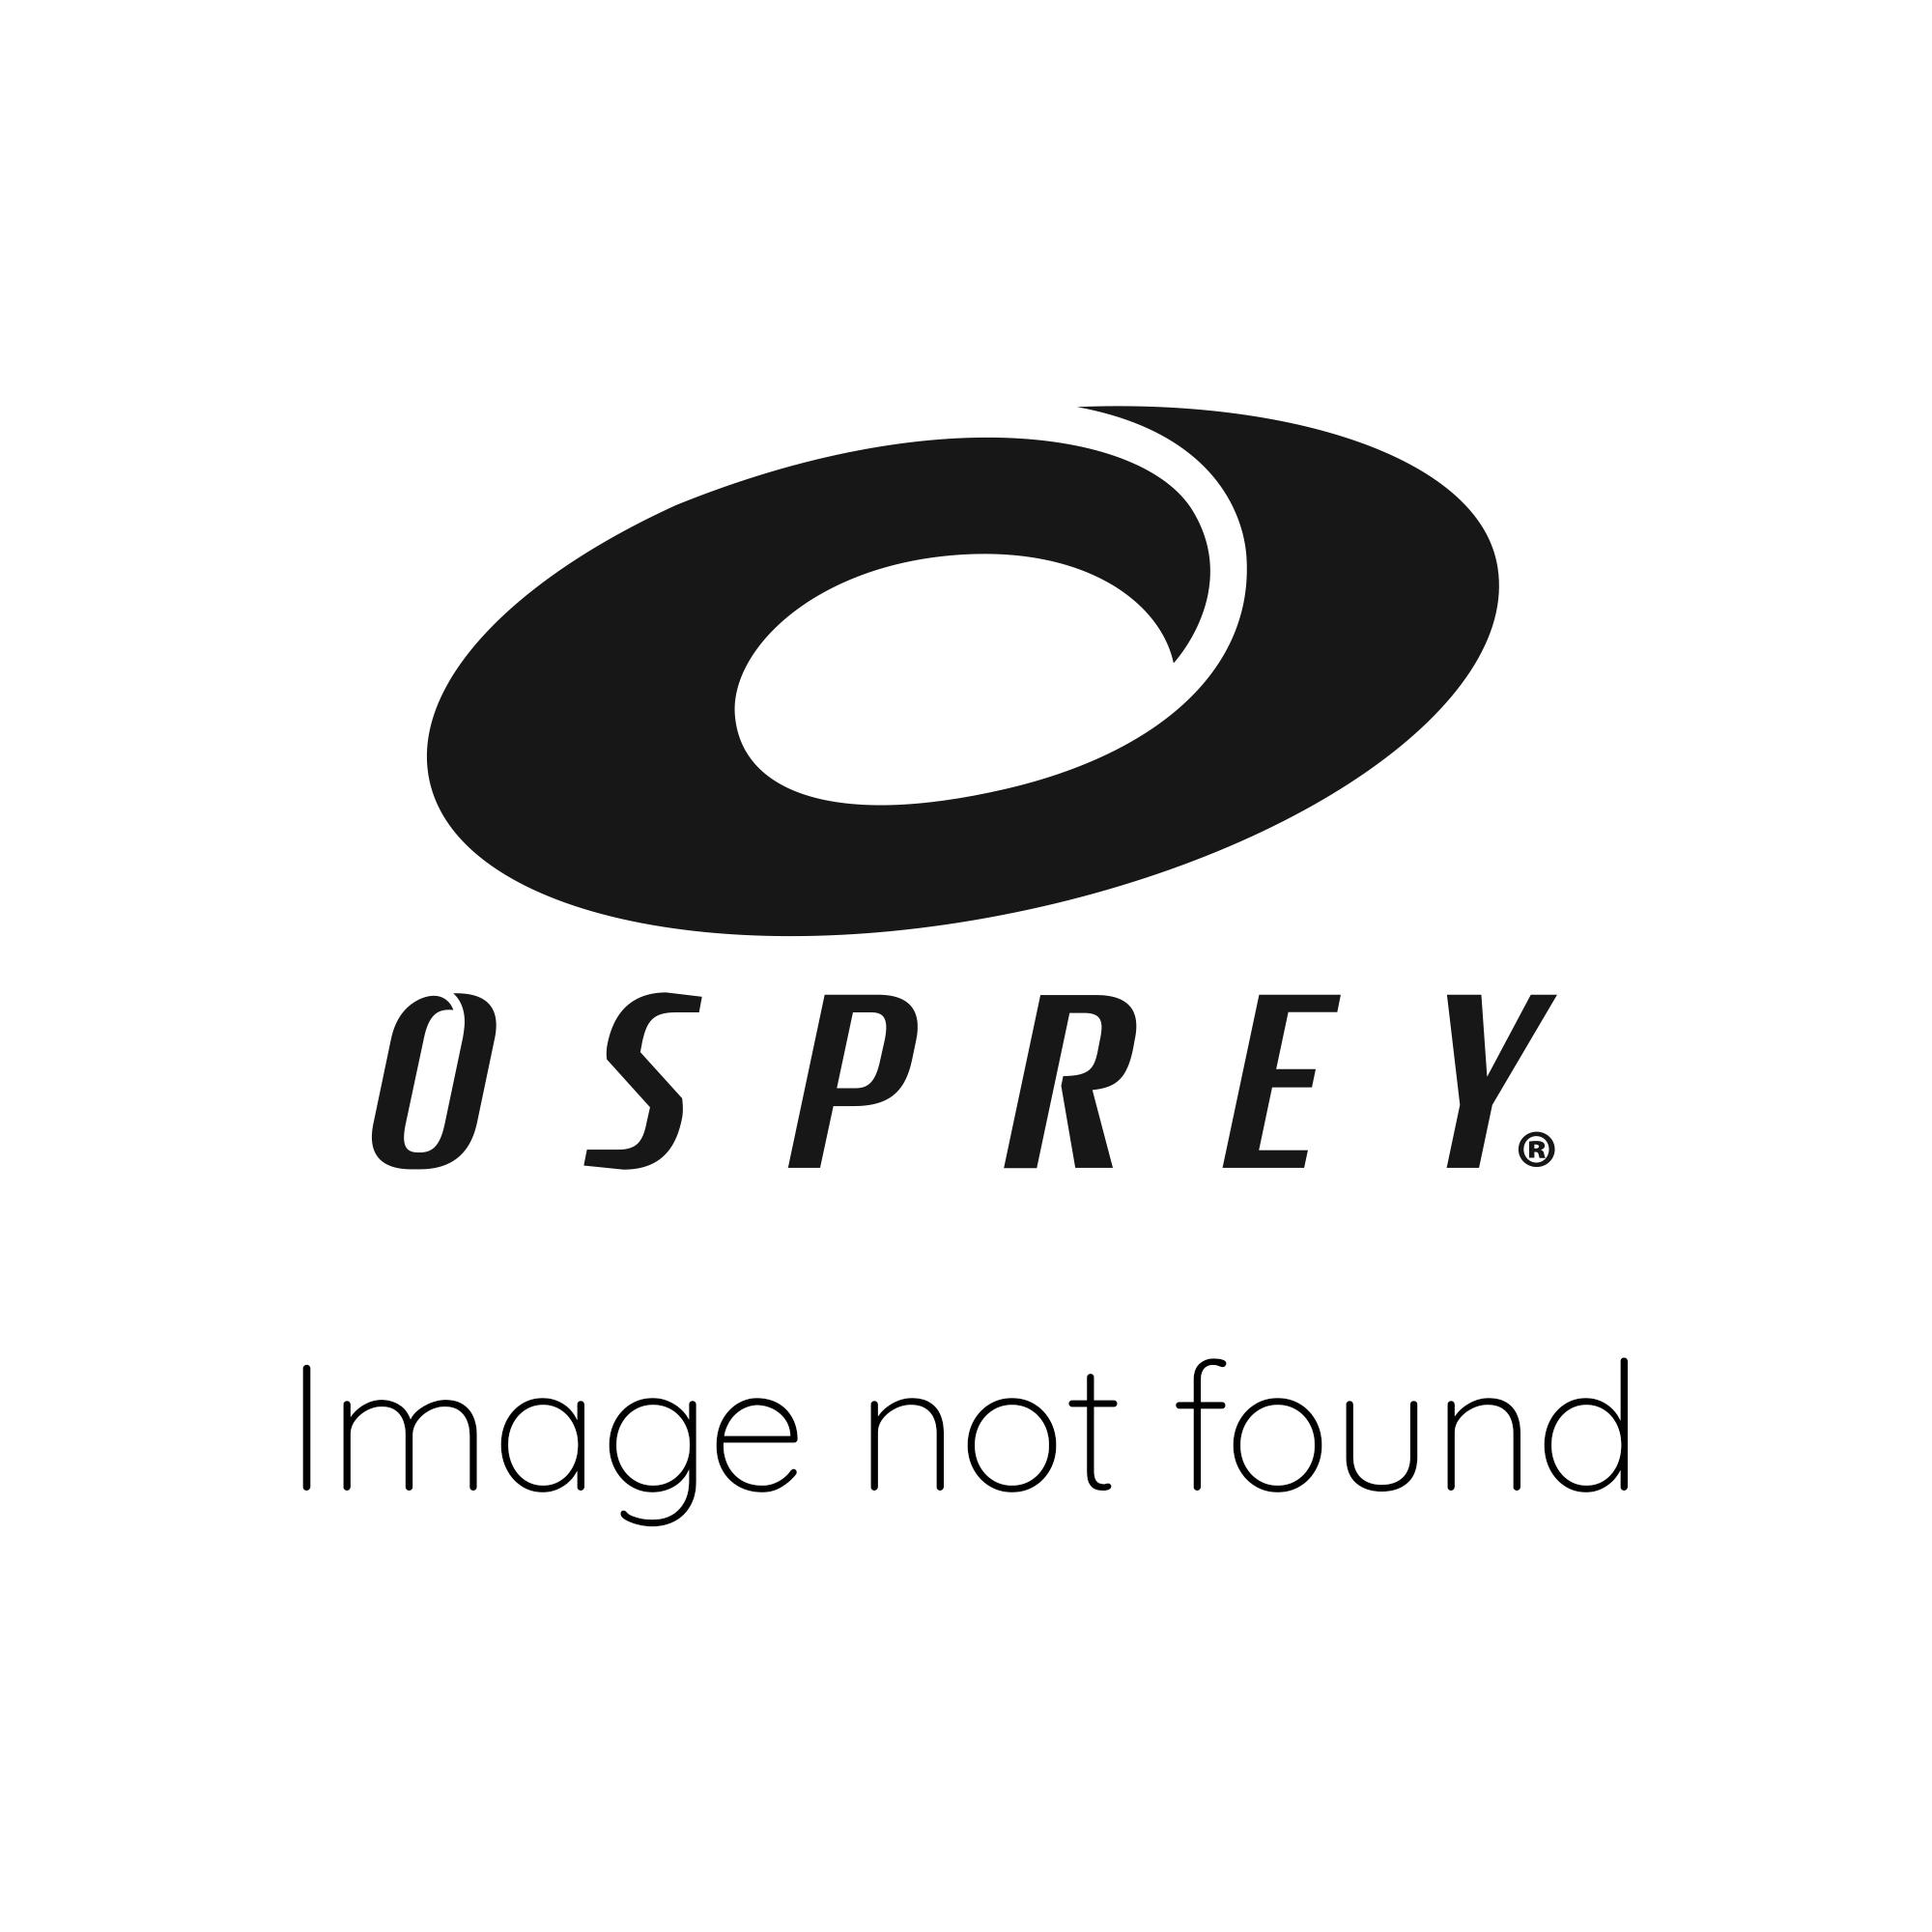 Osprey Womens 3mm Origin Full Length Wetsuit - Purple